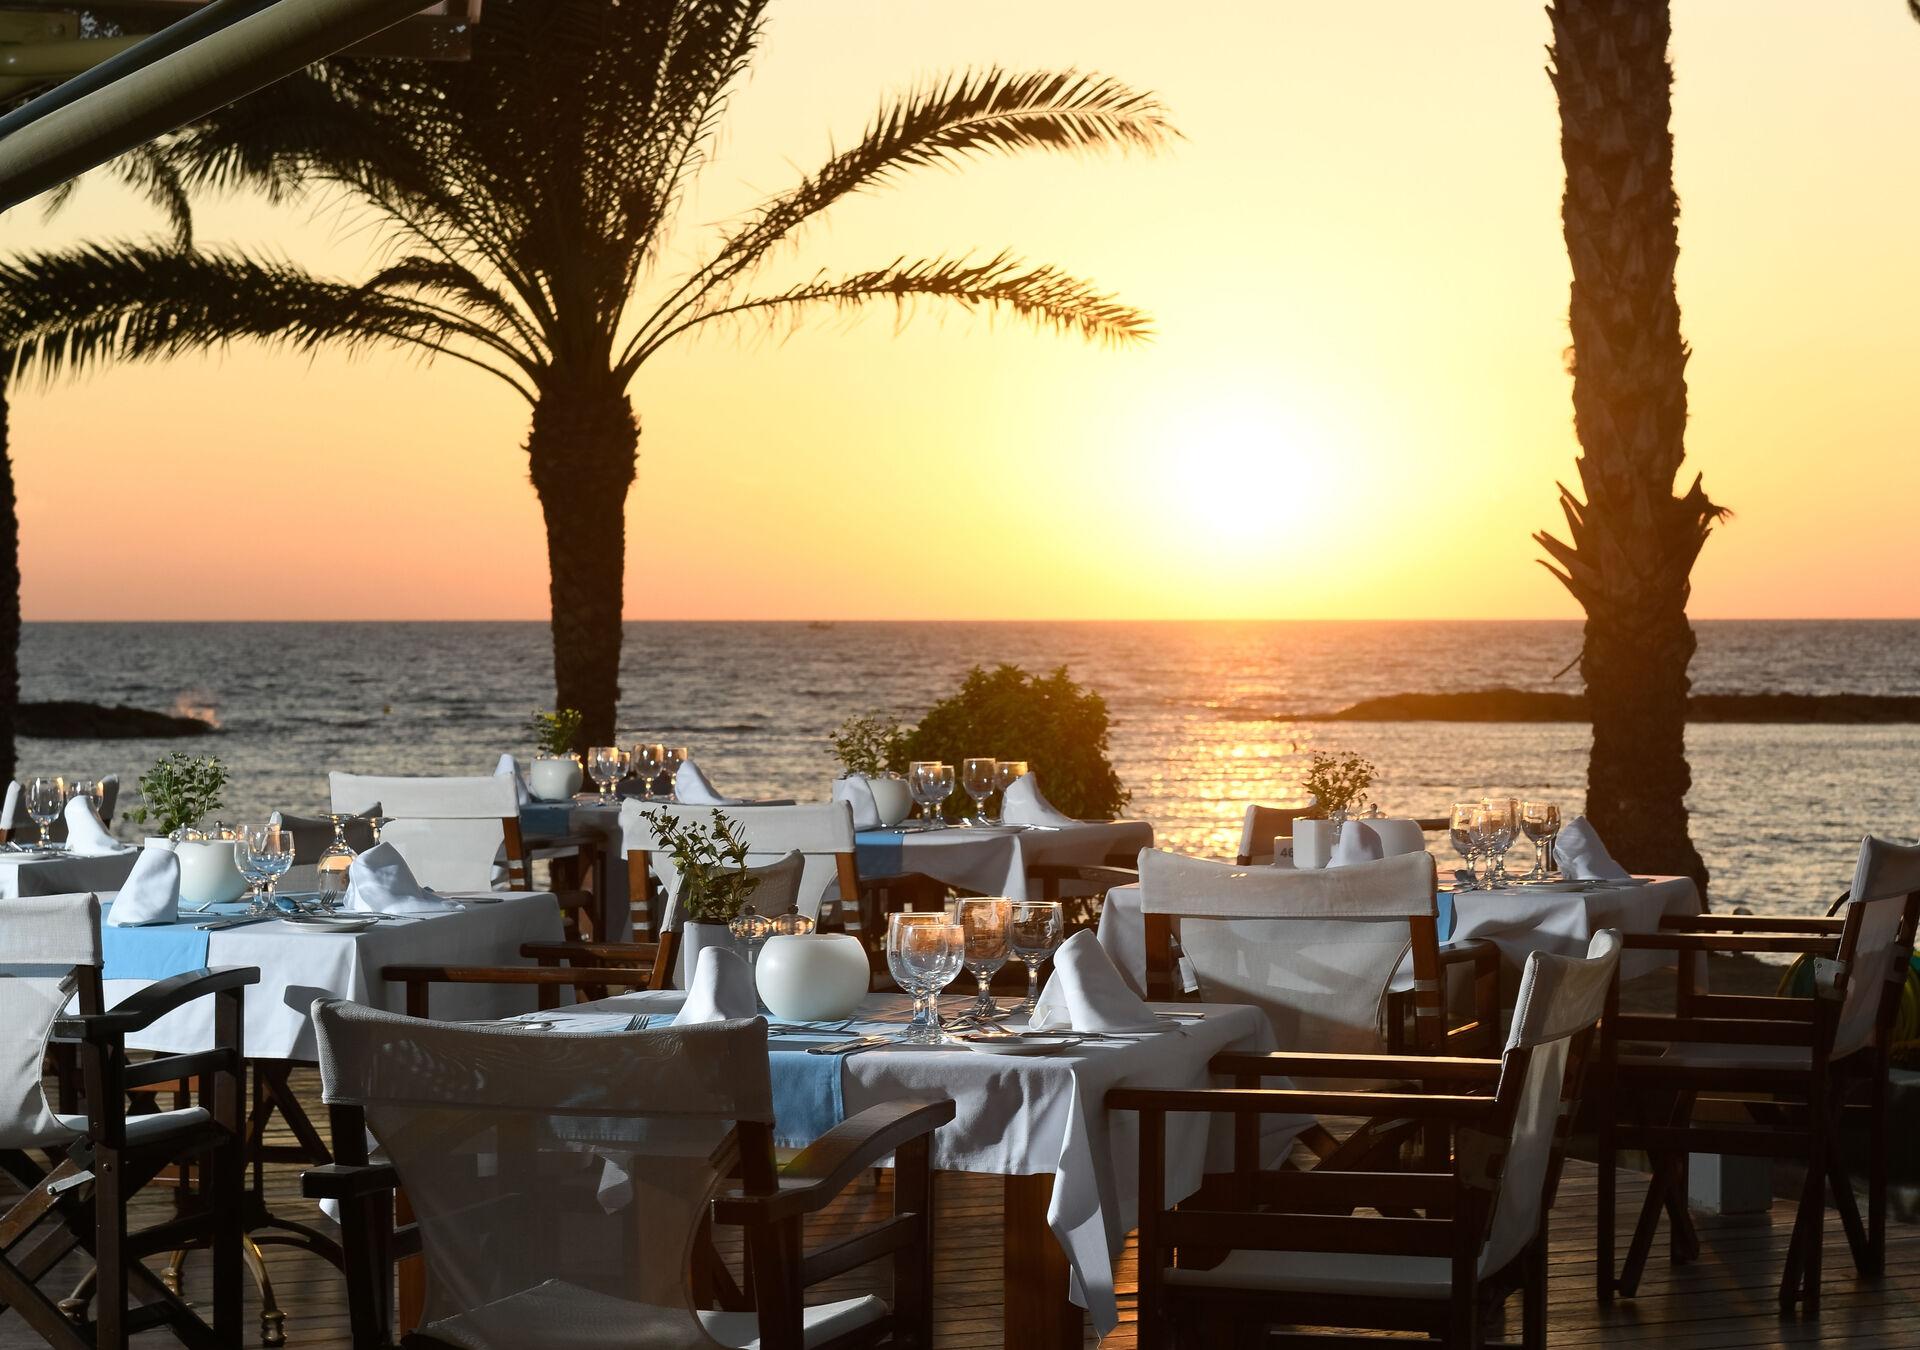 https://cms.satur.sk/data/imgs/tour_image/orig/13-pioneer-beach-hotel-thalassa-mediterranean-restaurant-2-1972638.jpg